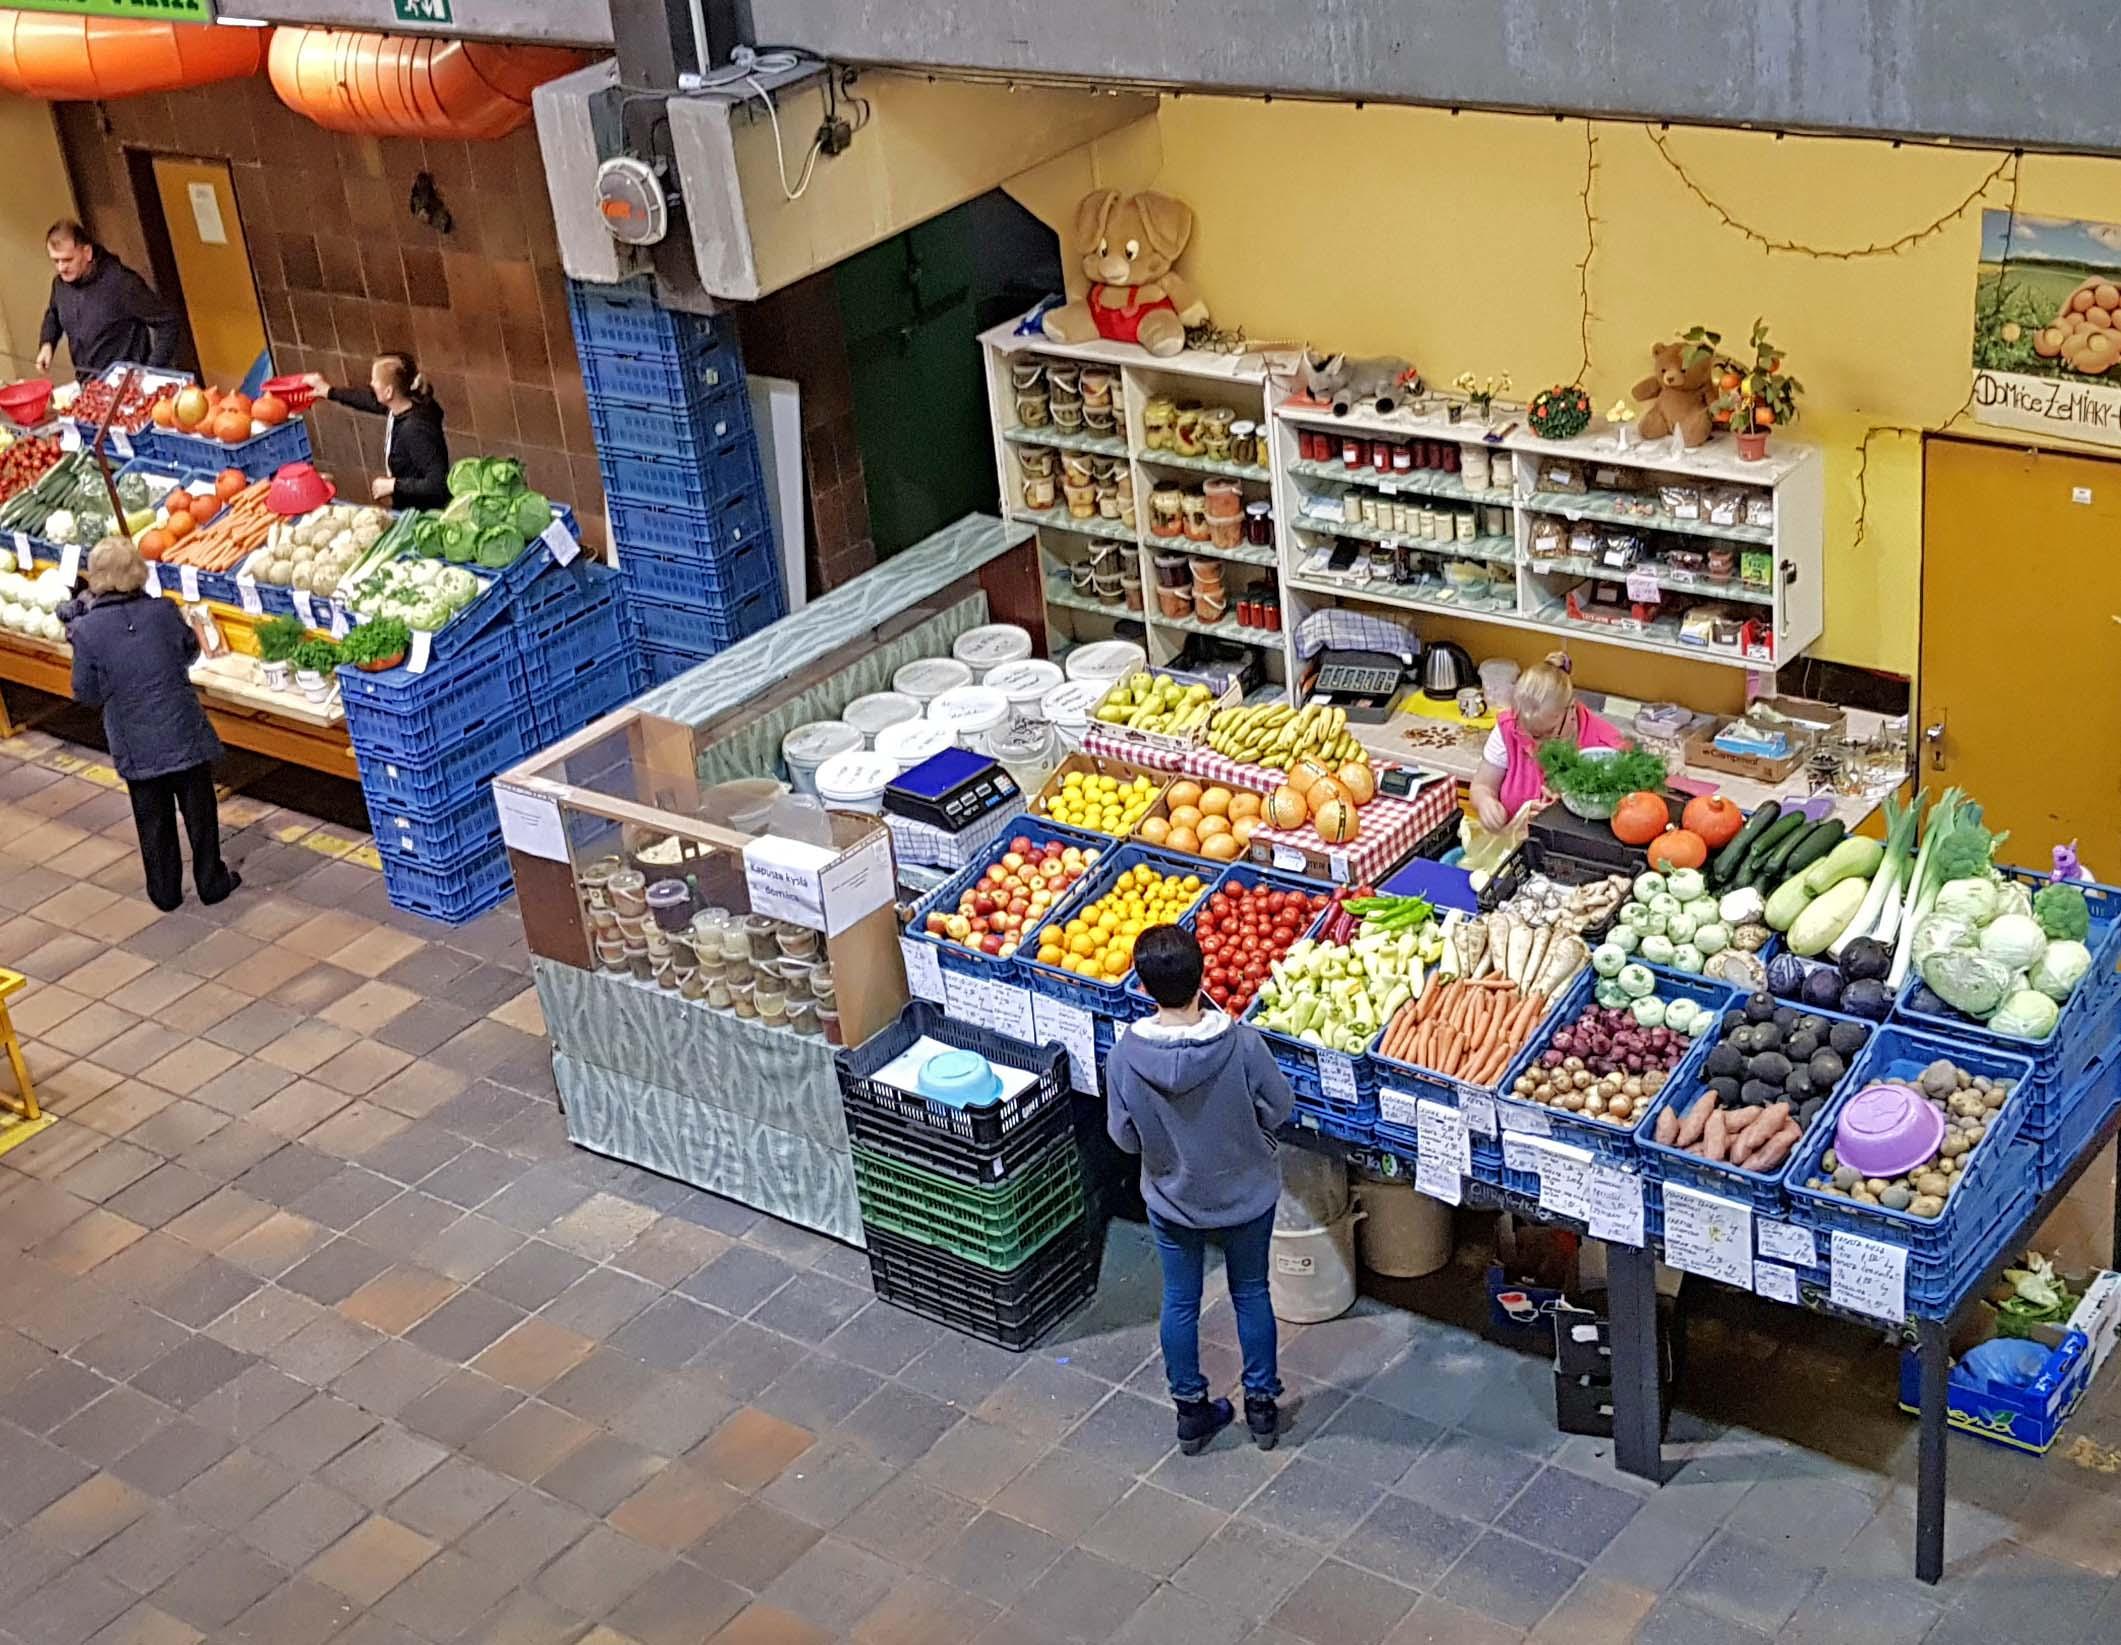 Tržnica farmer's market